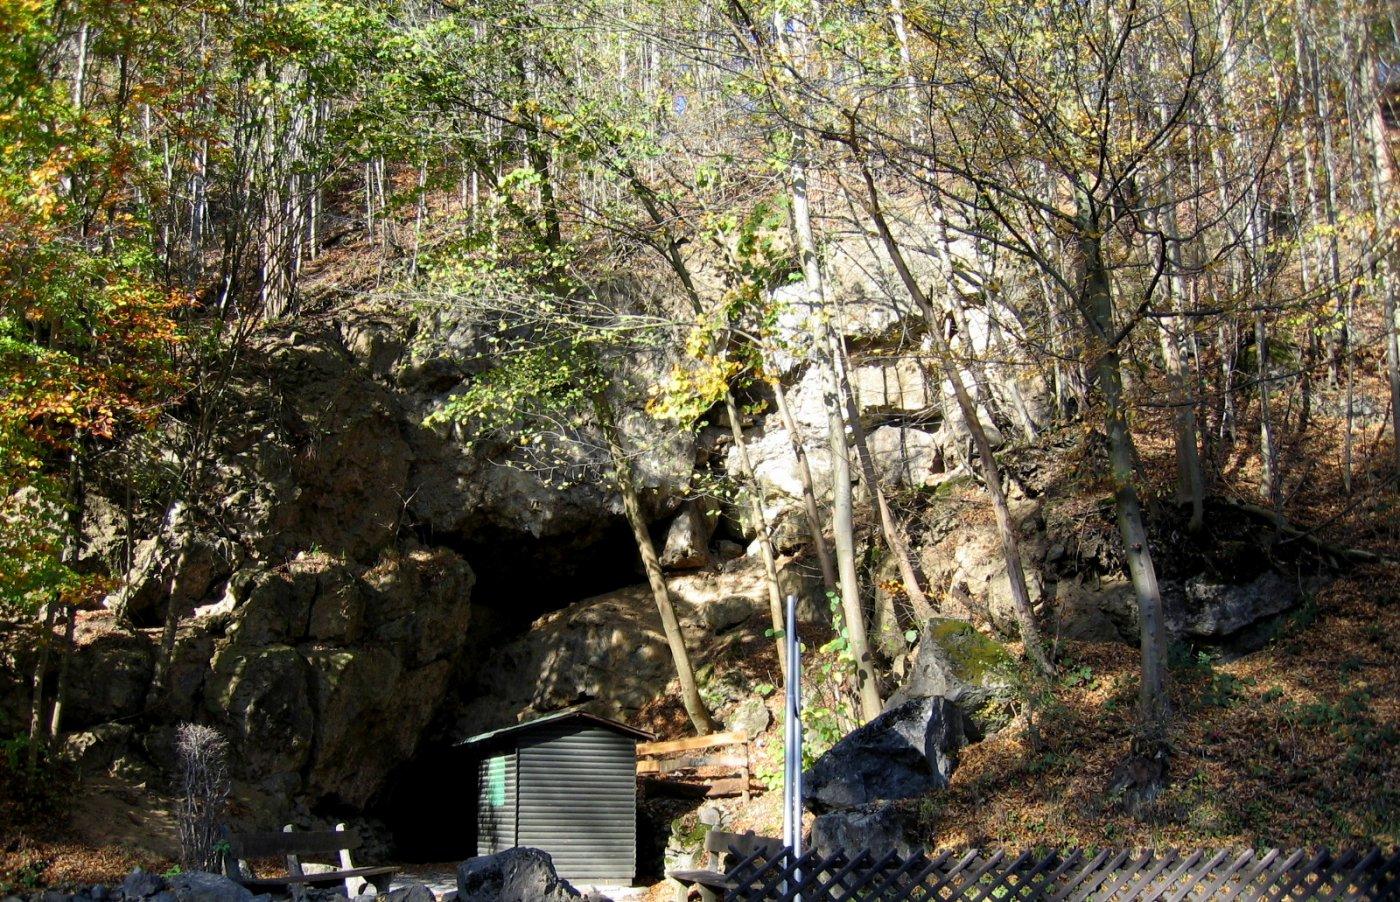 Фото Пещера Рекен. Германия, Nordrhein-Westfalen, Balve, B515